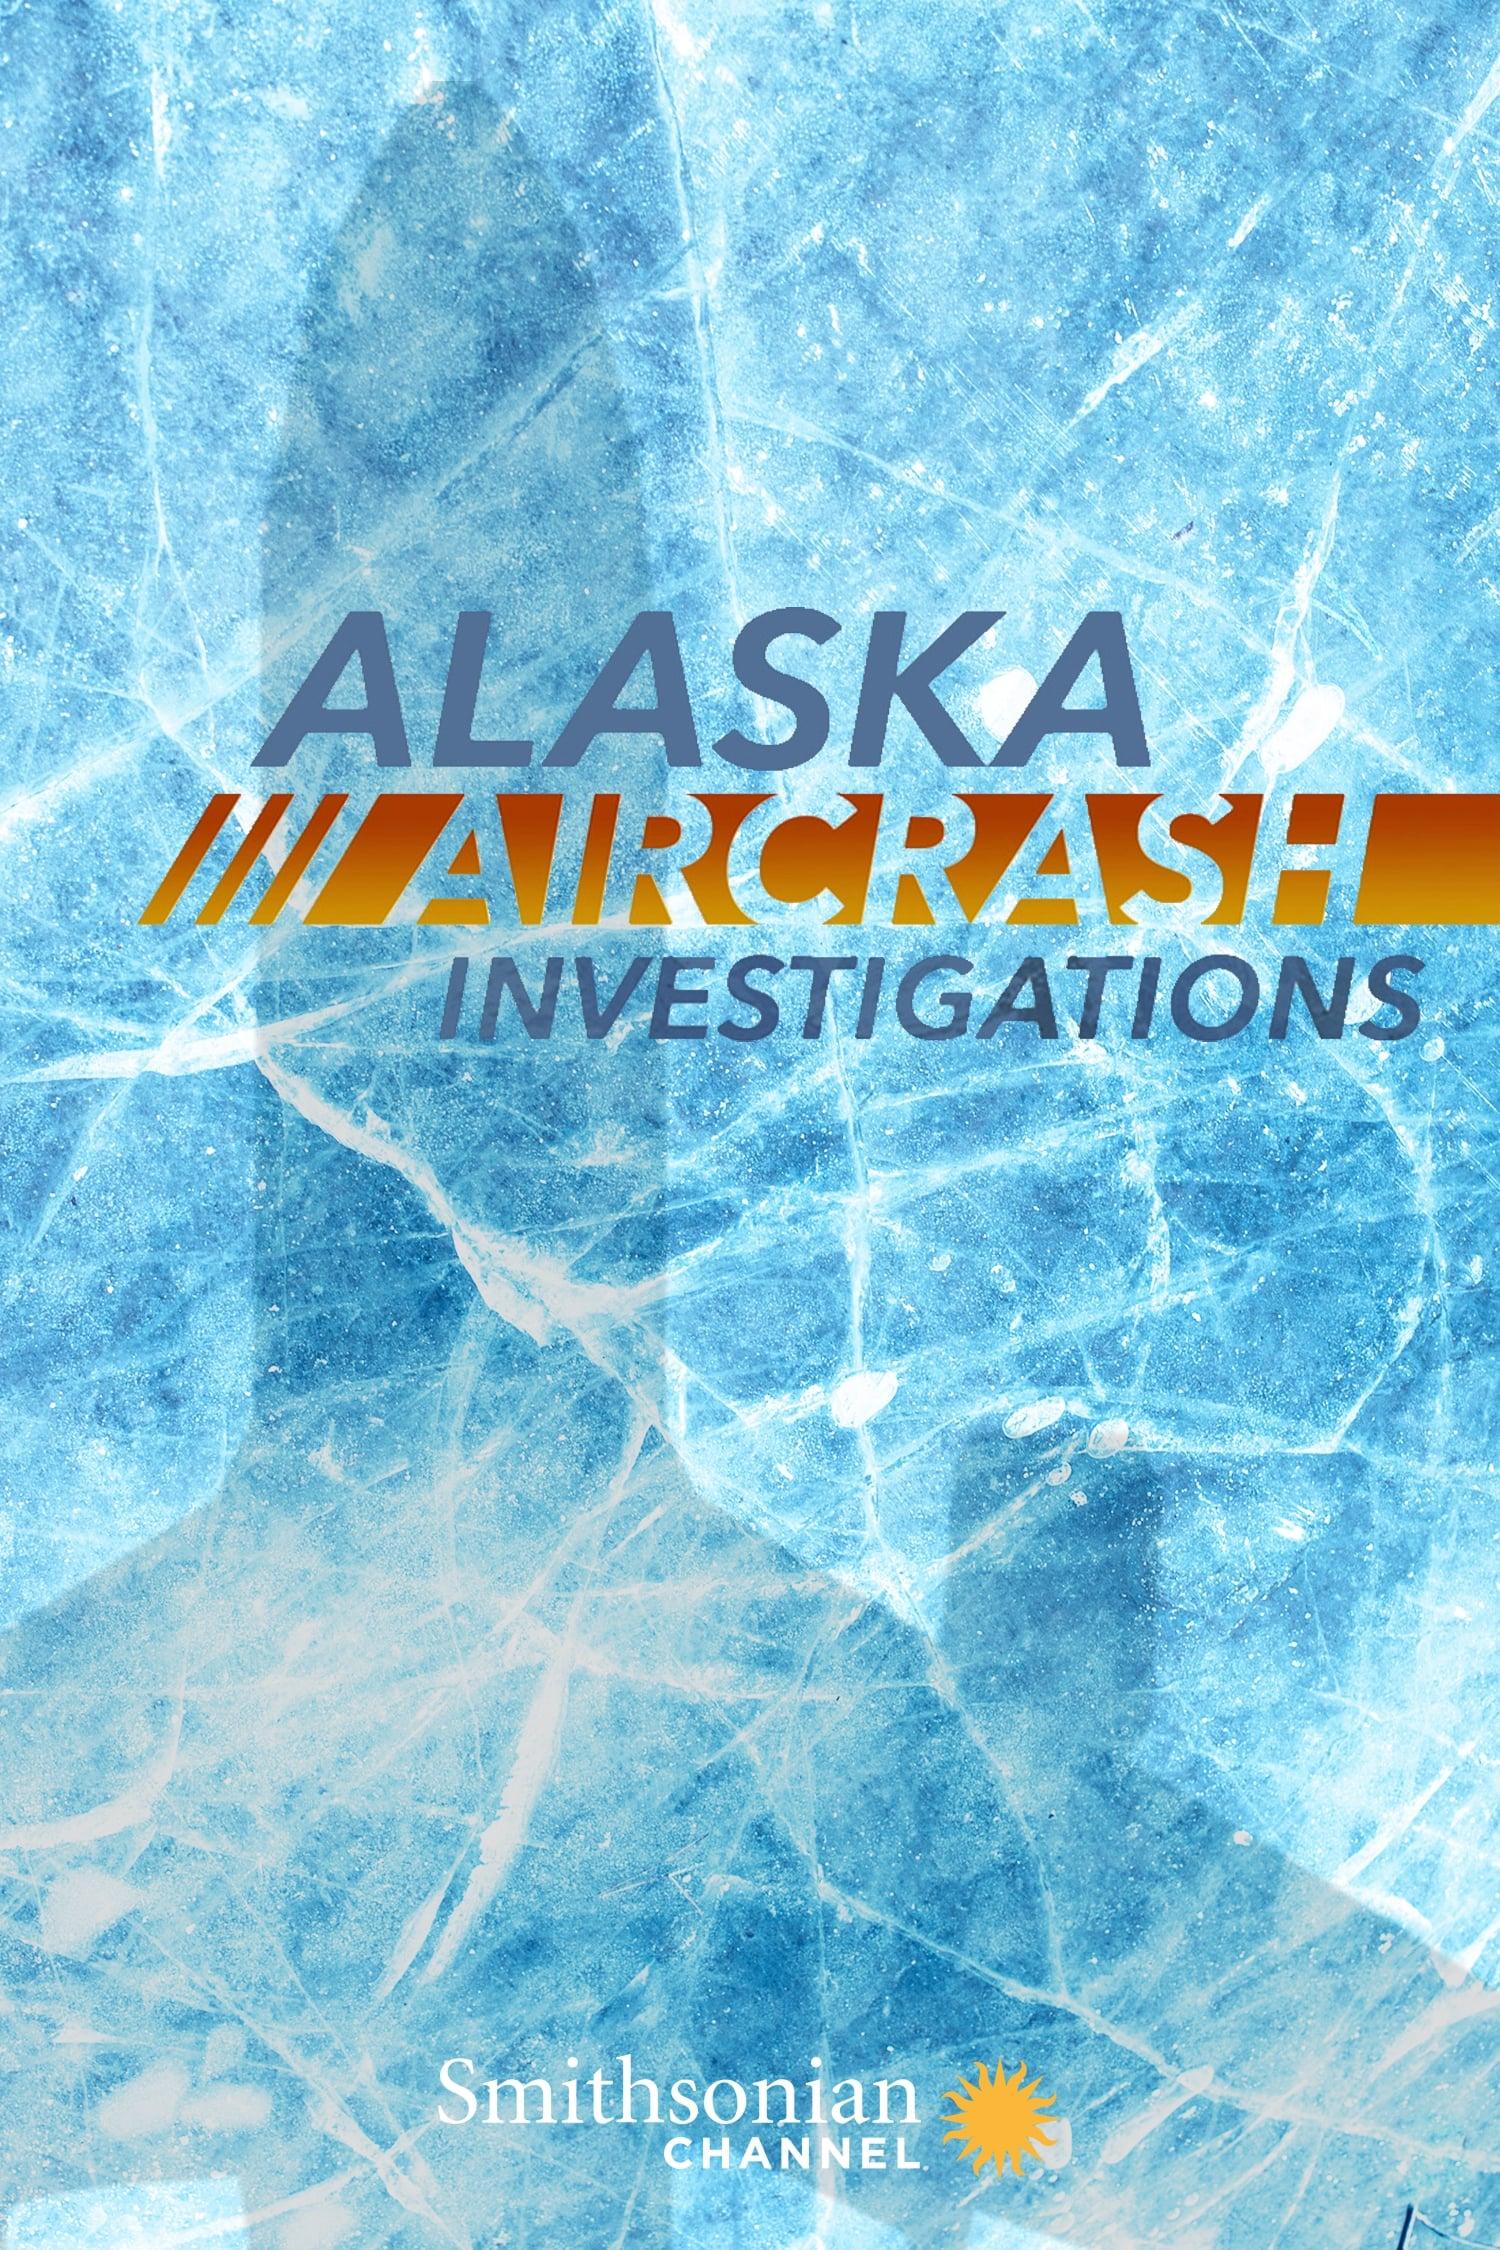 Alaska Aircrash Investigations TV Shows About Disaster